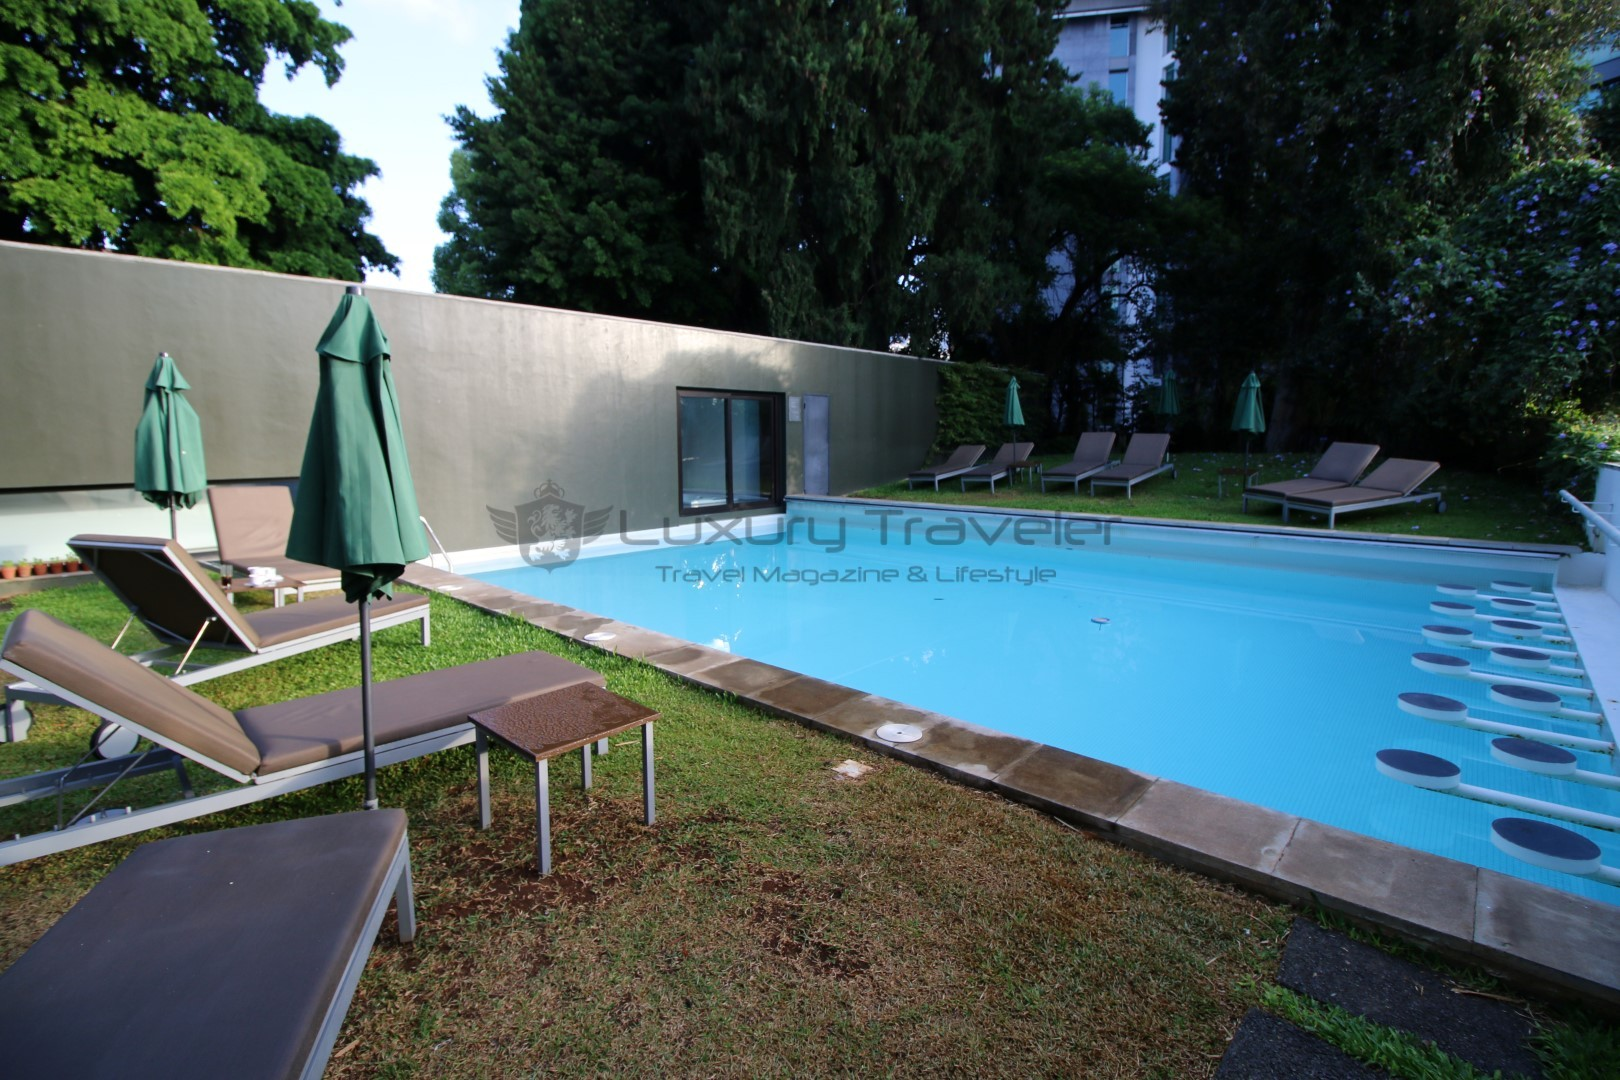 quintinha_sao_joao_funchal_madeira_hotel_exterior_pool